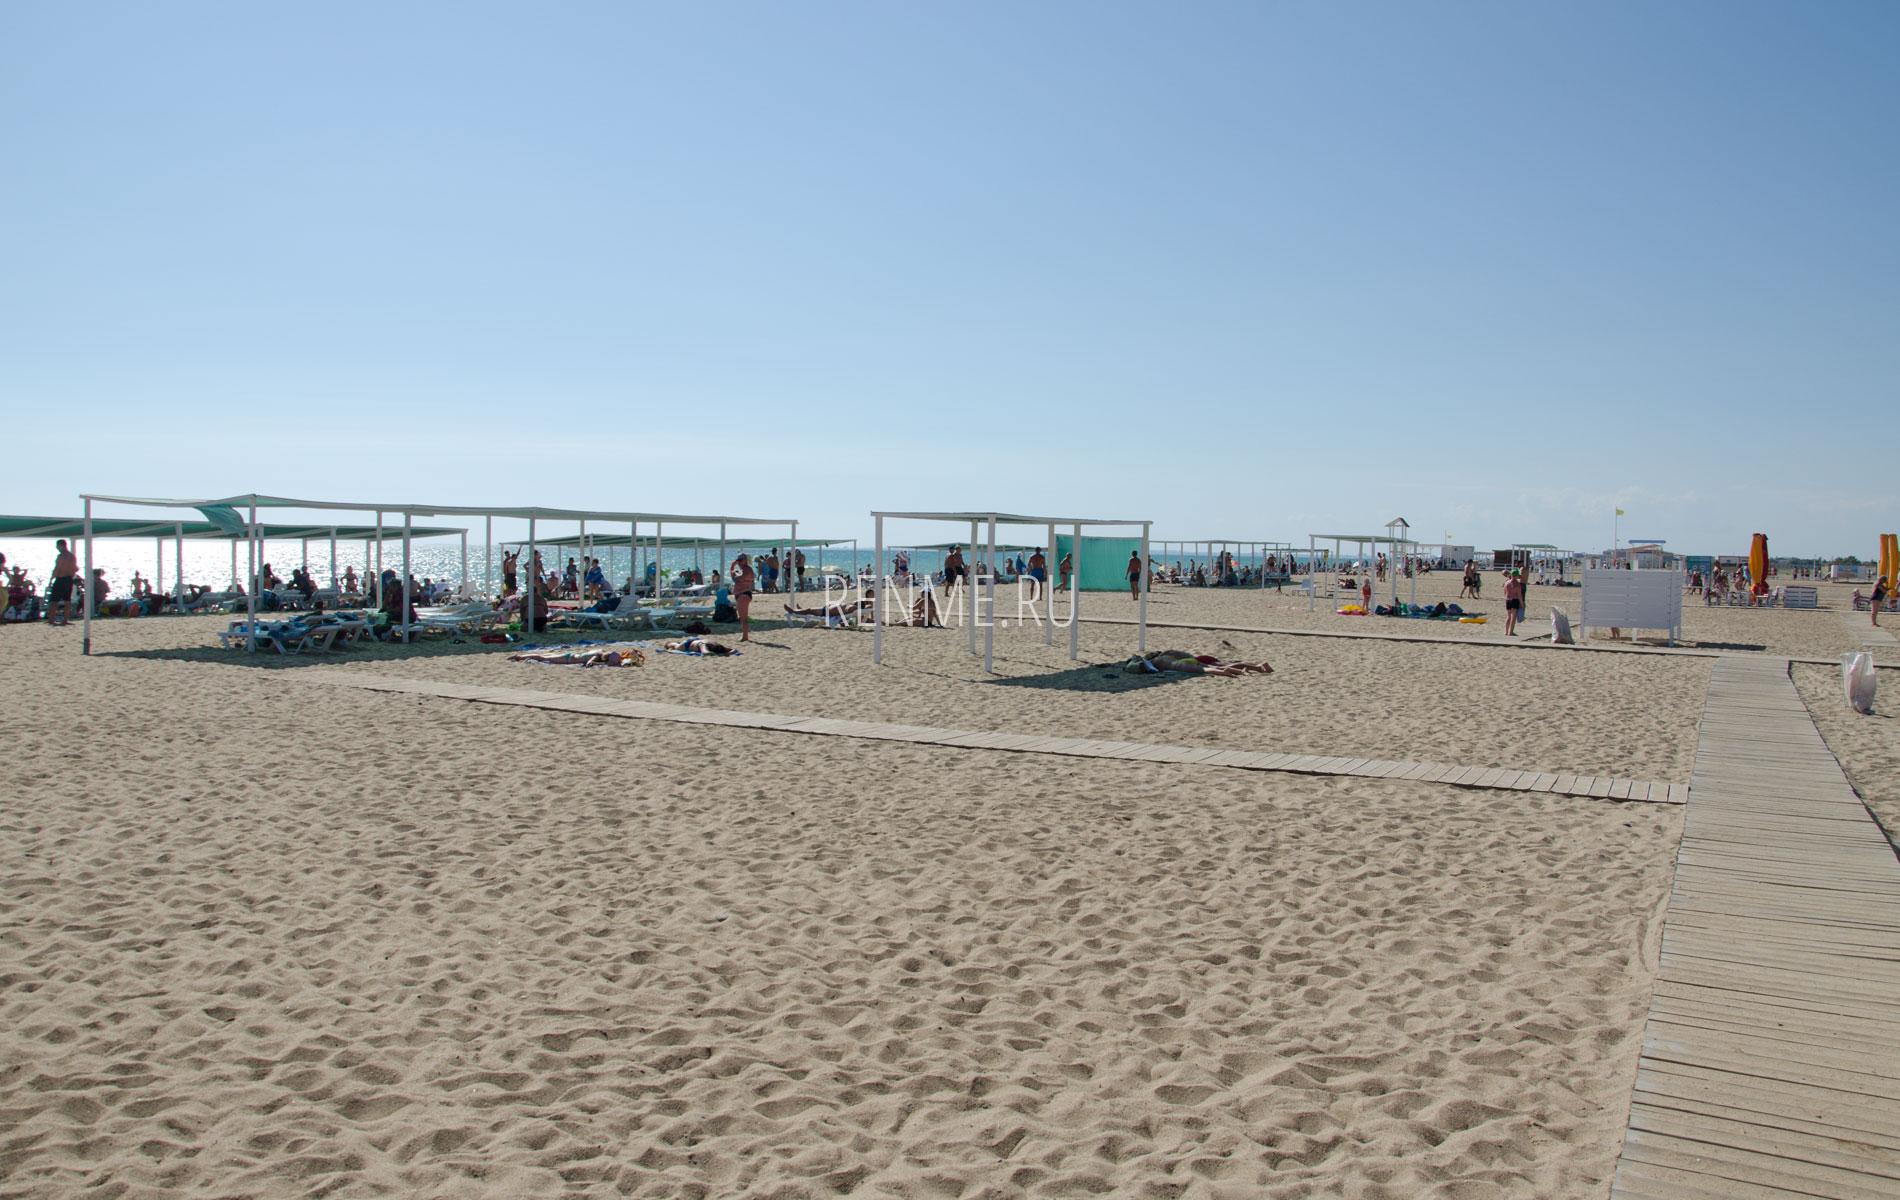 Золотой песок на пляже в Саказ. Фото Сак